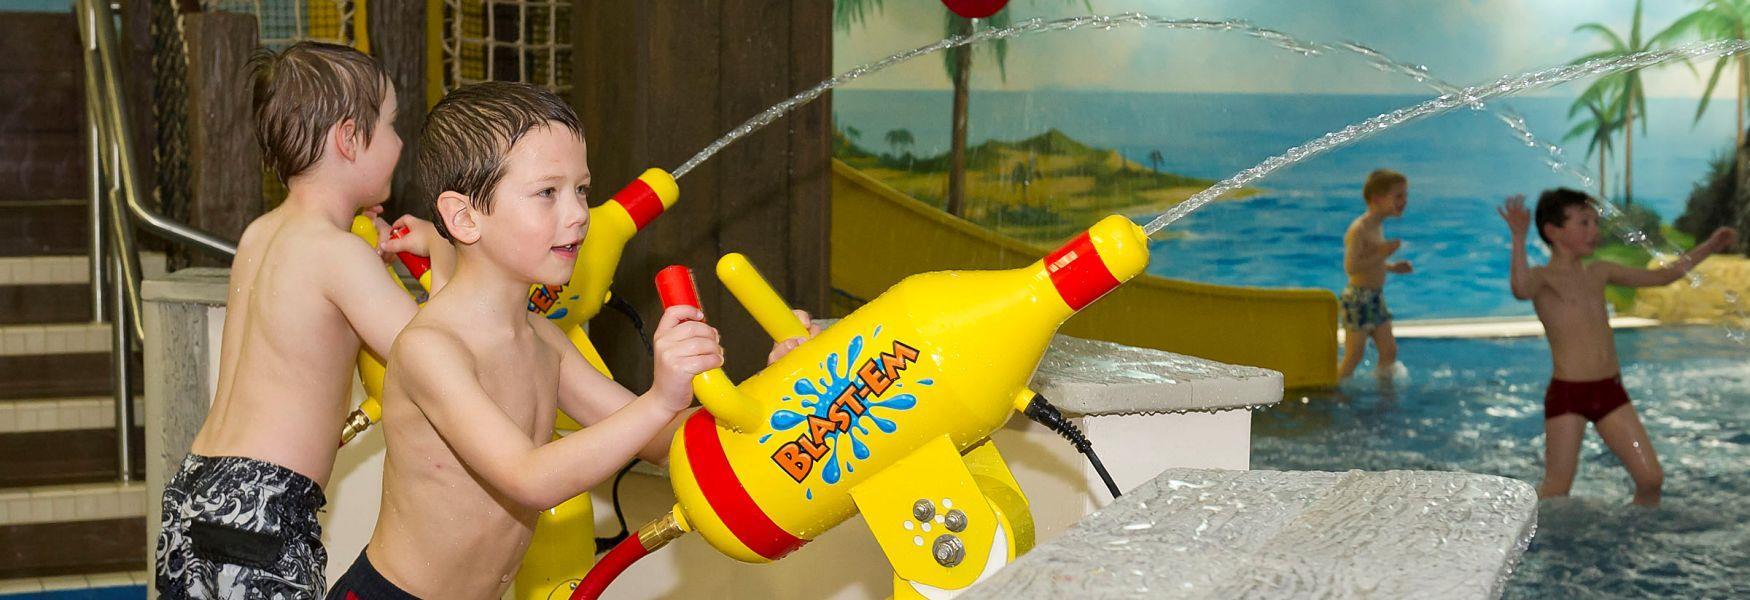 Children will love the LEGO Pirates Themed splash pool at the LEGOLAND hotel